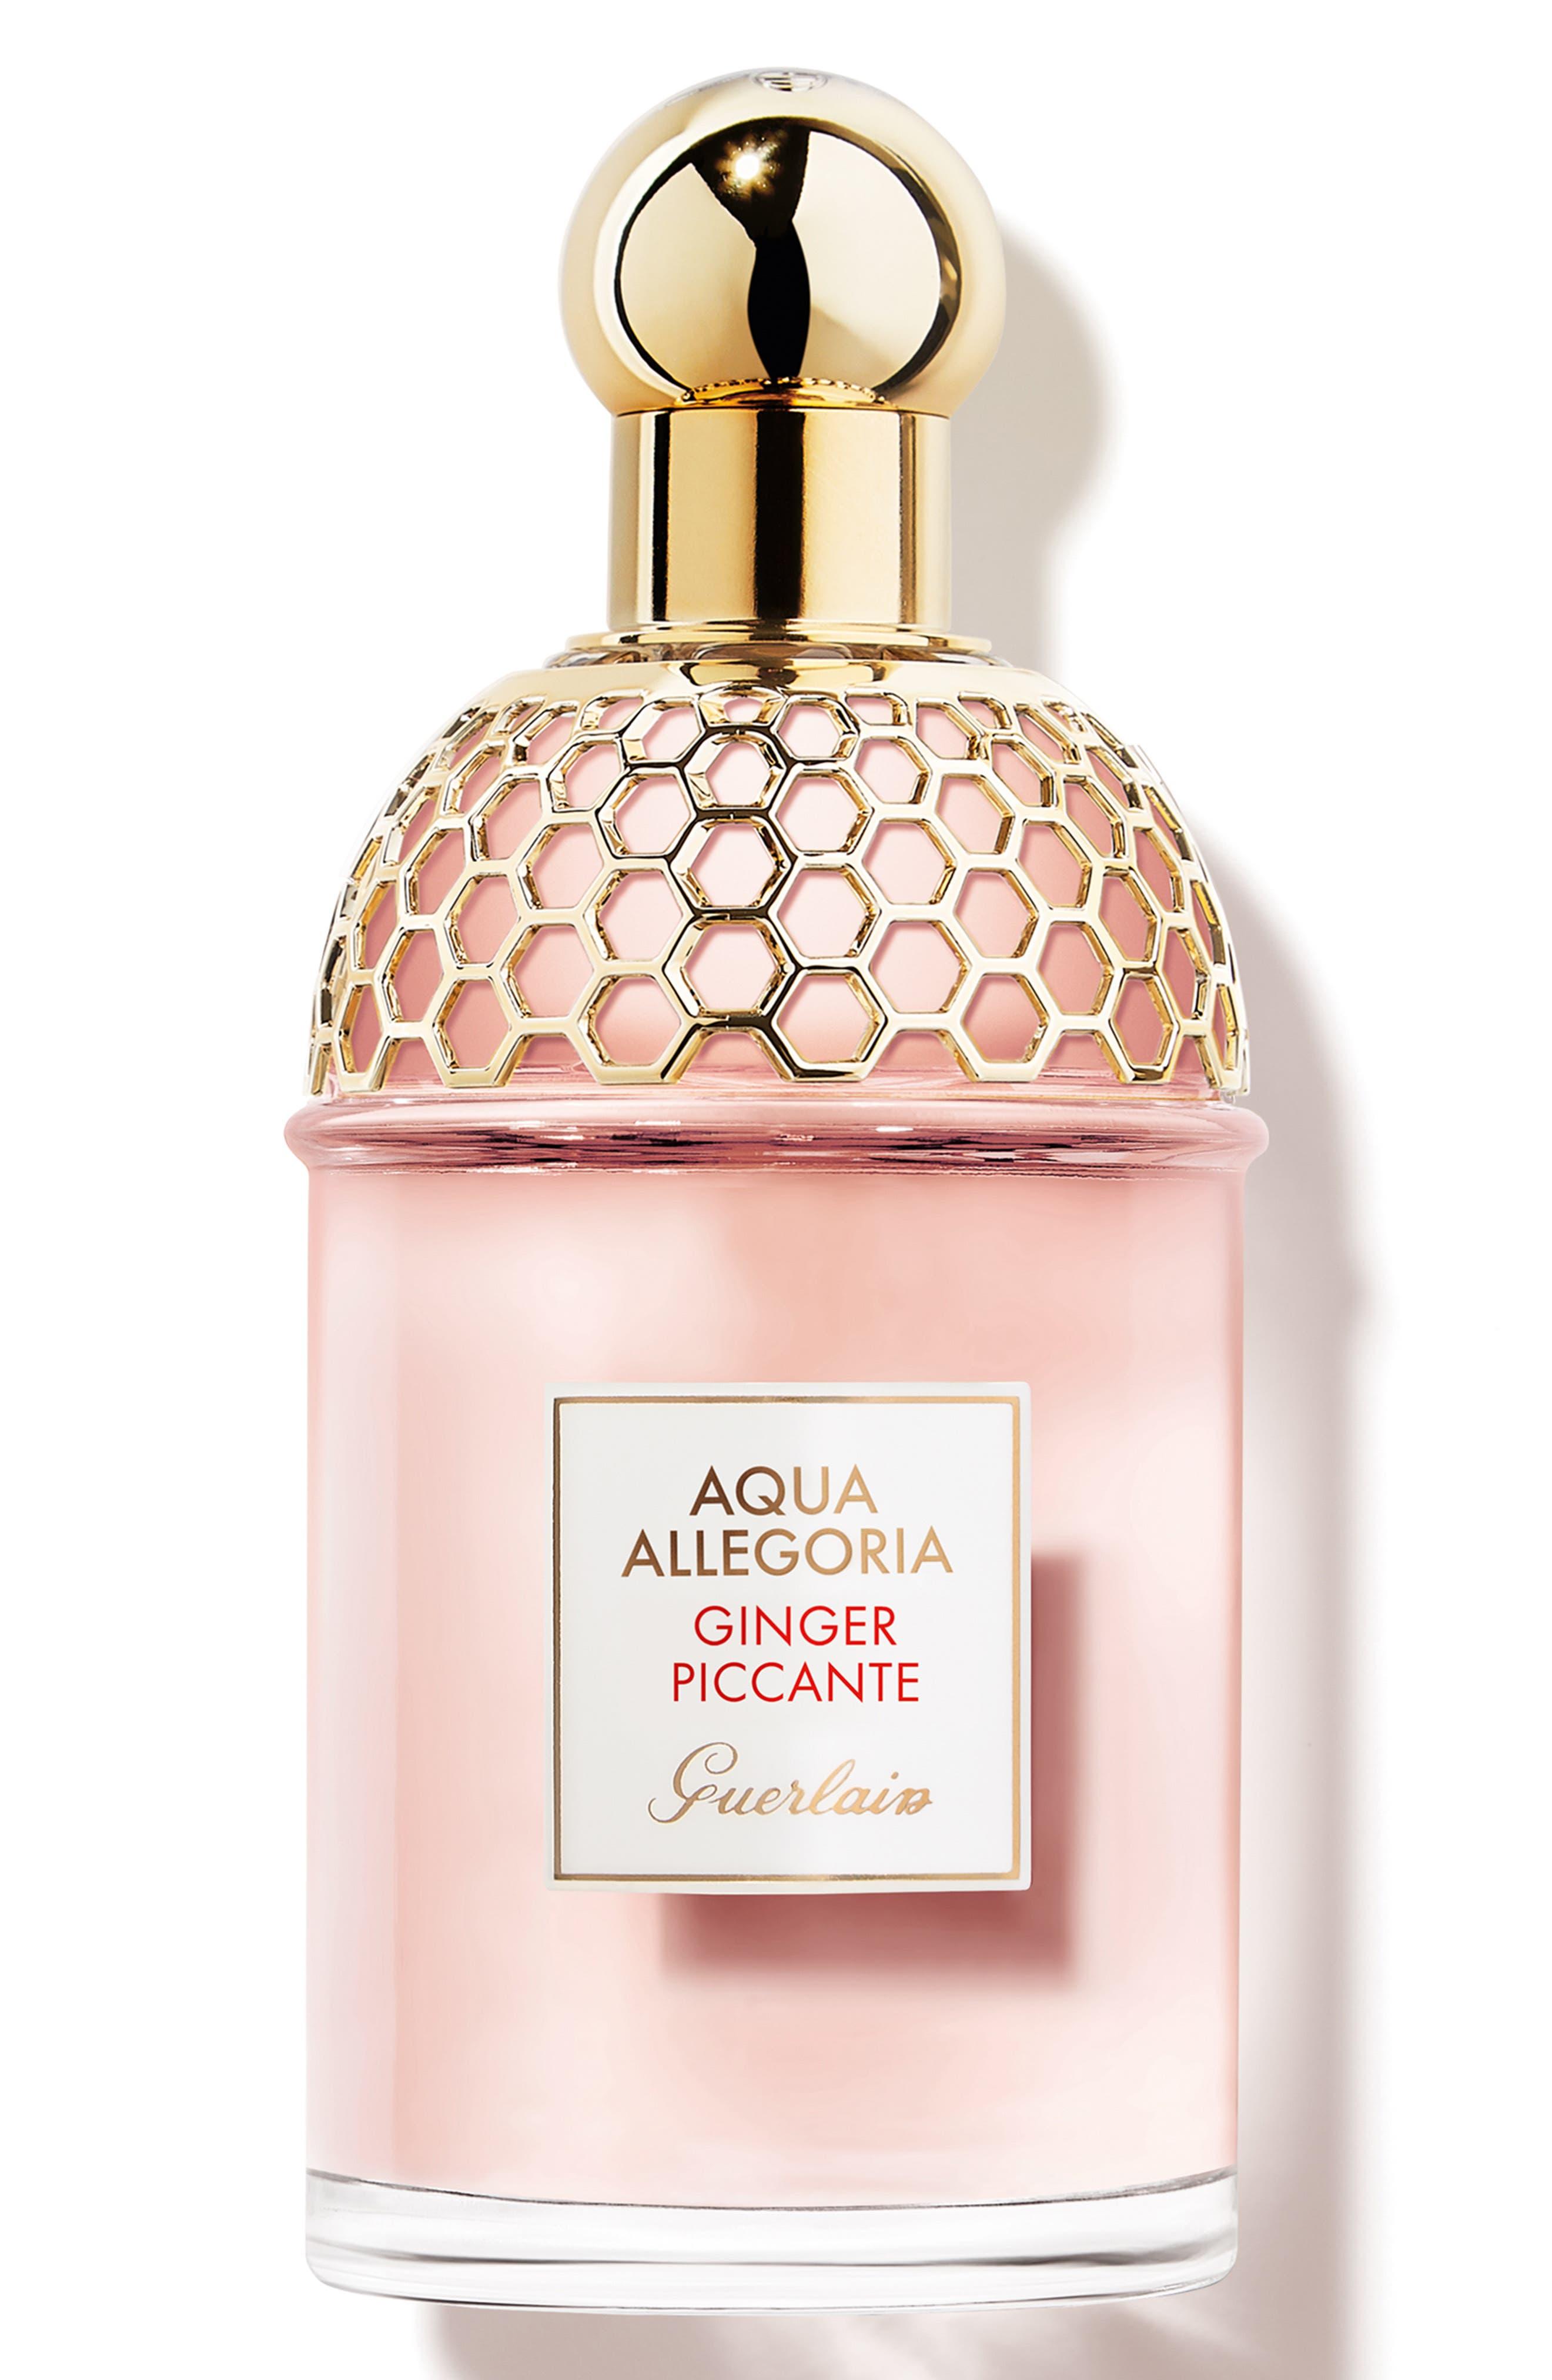 Aqua Allegoria Ginger Piccante Eau De Toilette